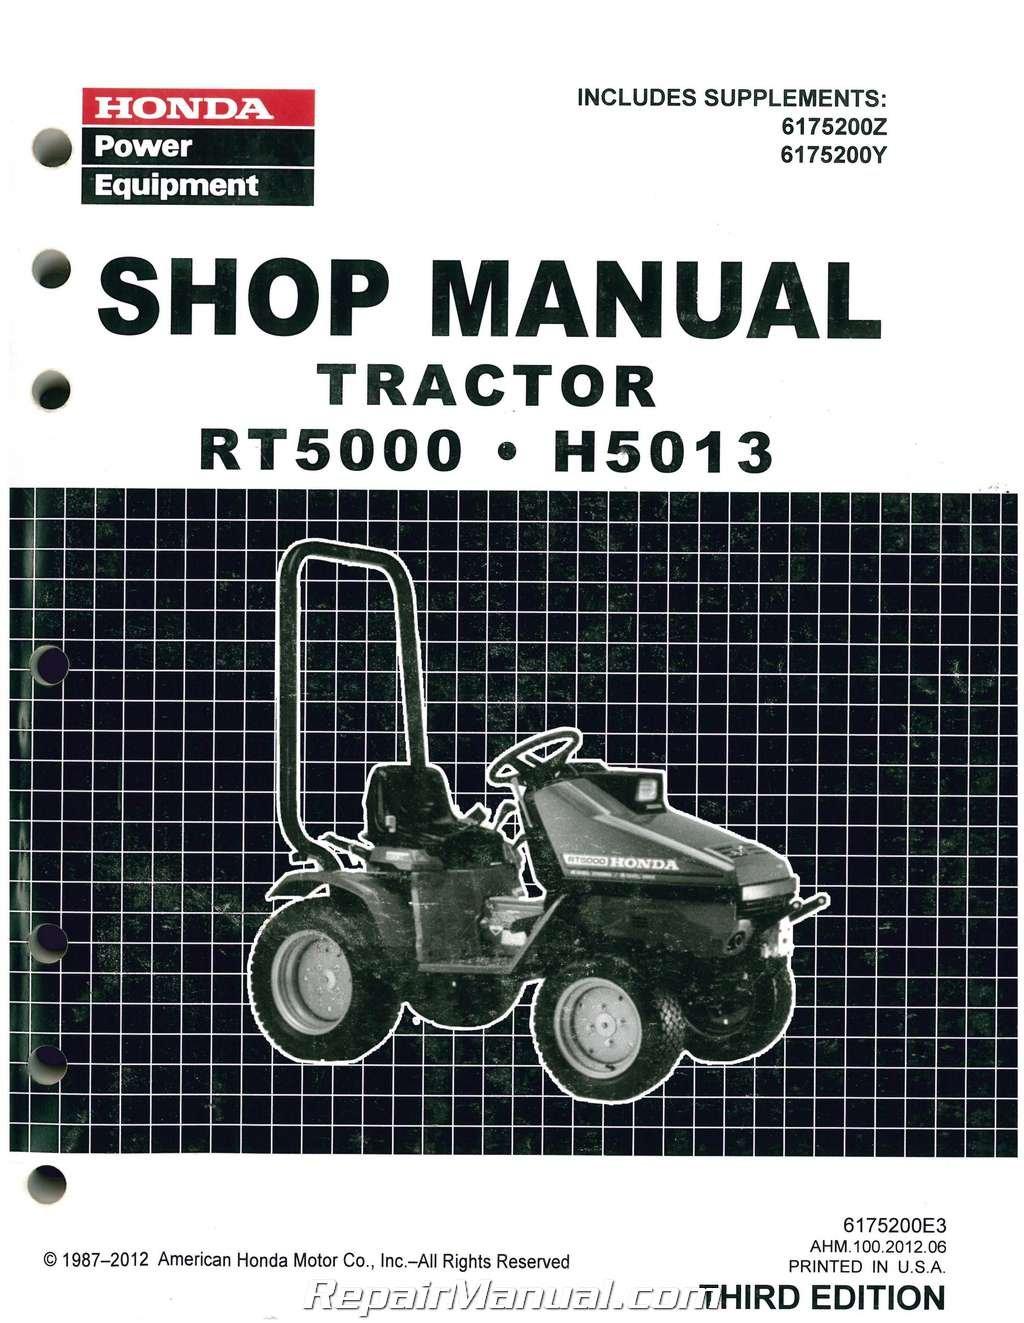 6175200E3 Honda H5013 RT5000 Lawn Tractor Shop Manual: Manufacturer:  Amazon.com: Books